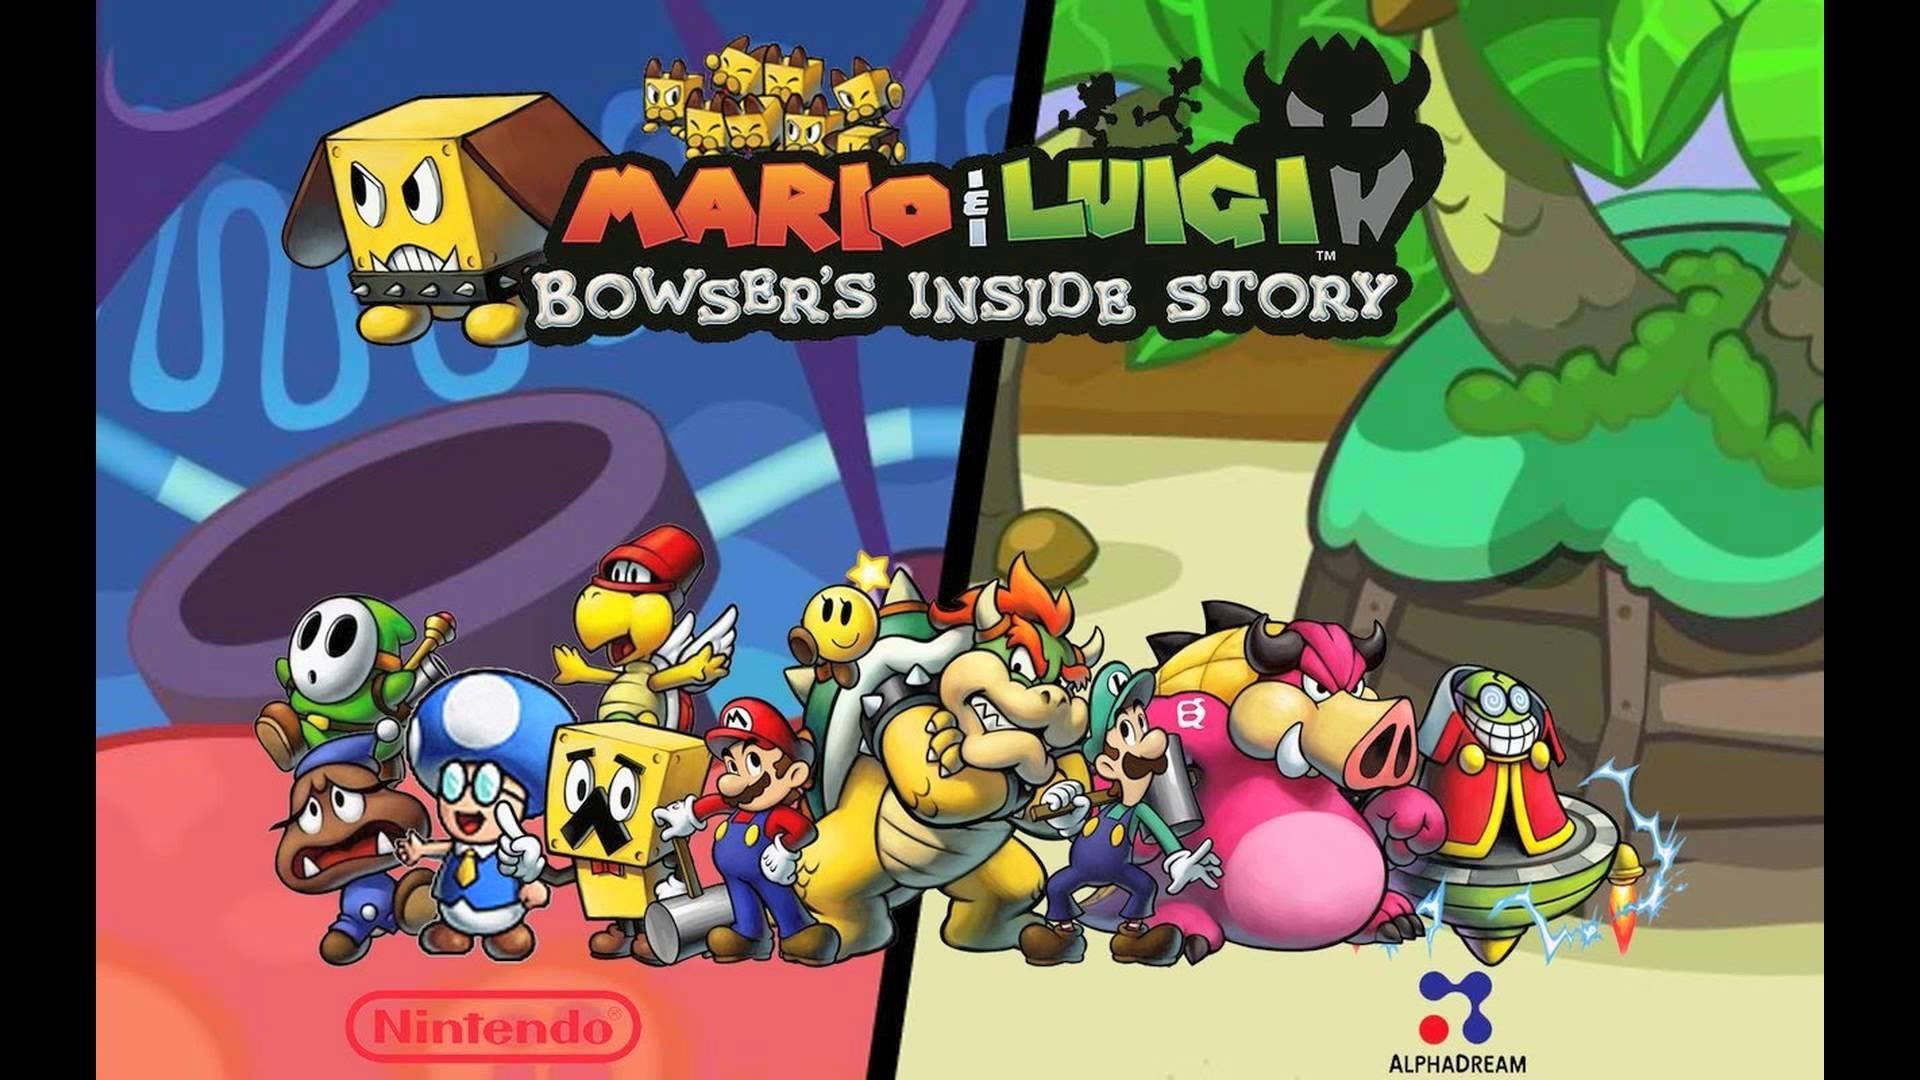 Res: 1920x1080, Mario & Luigi: Bowser's Inside Story HD Wallpaper HD